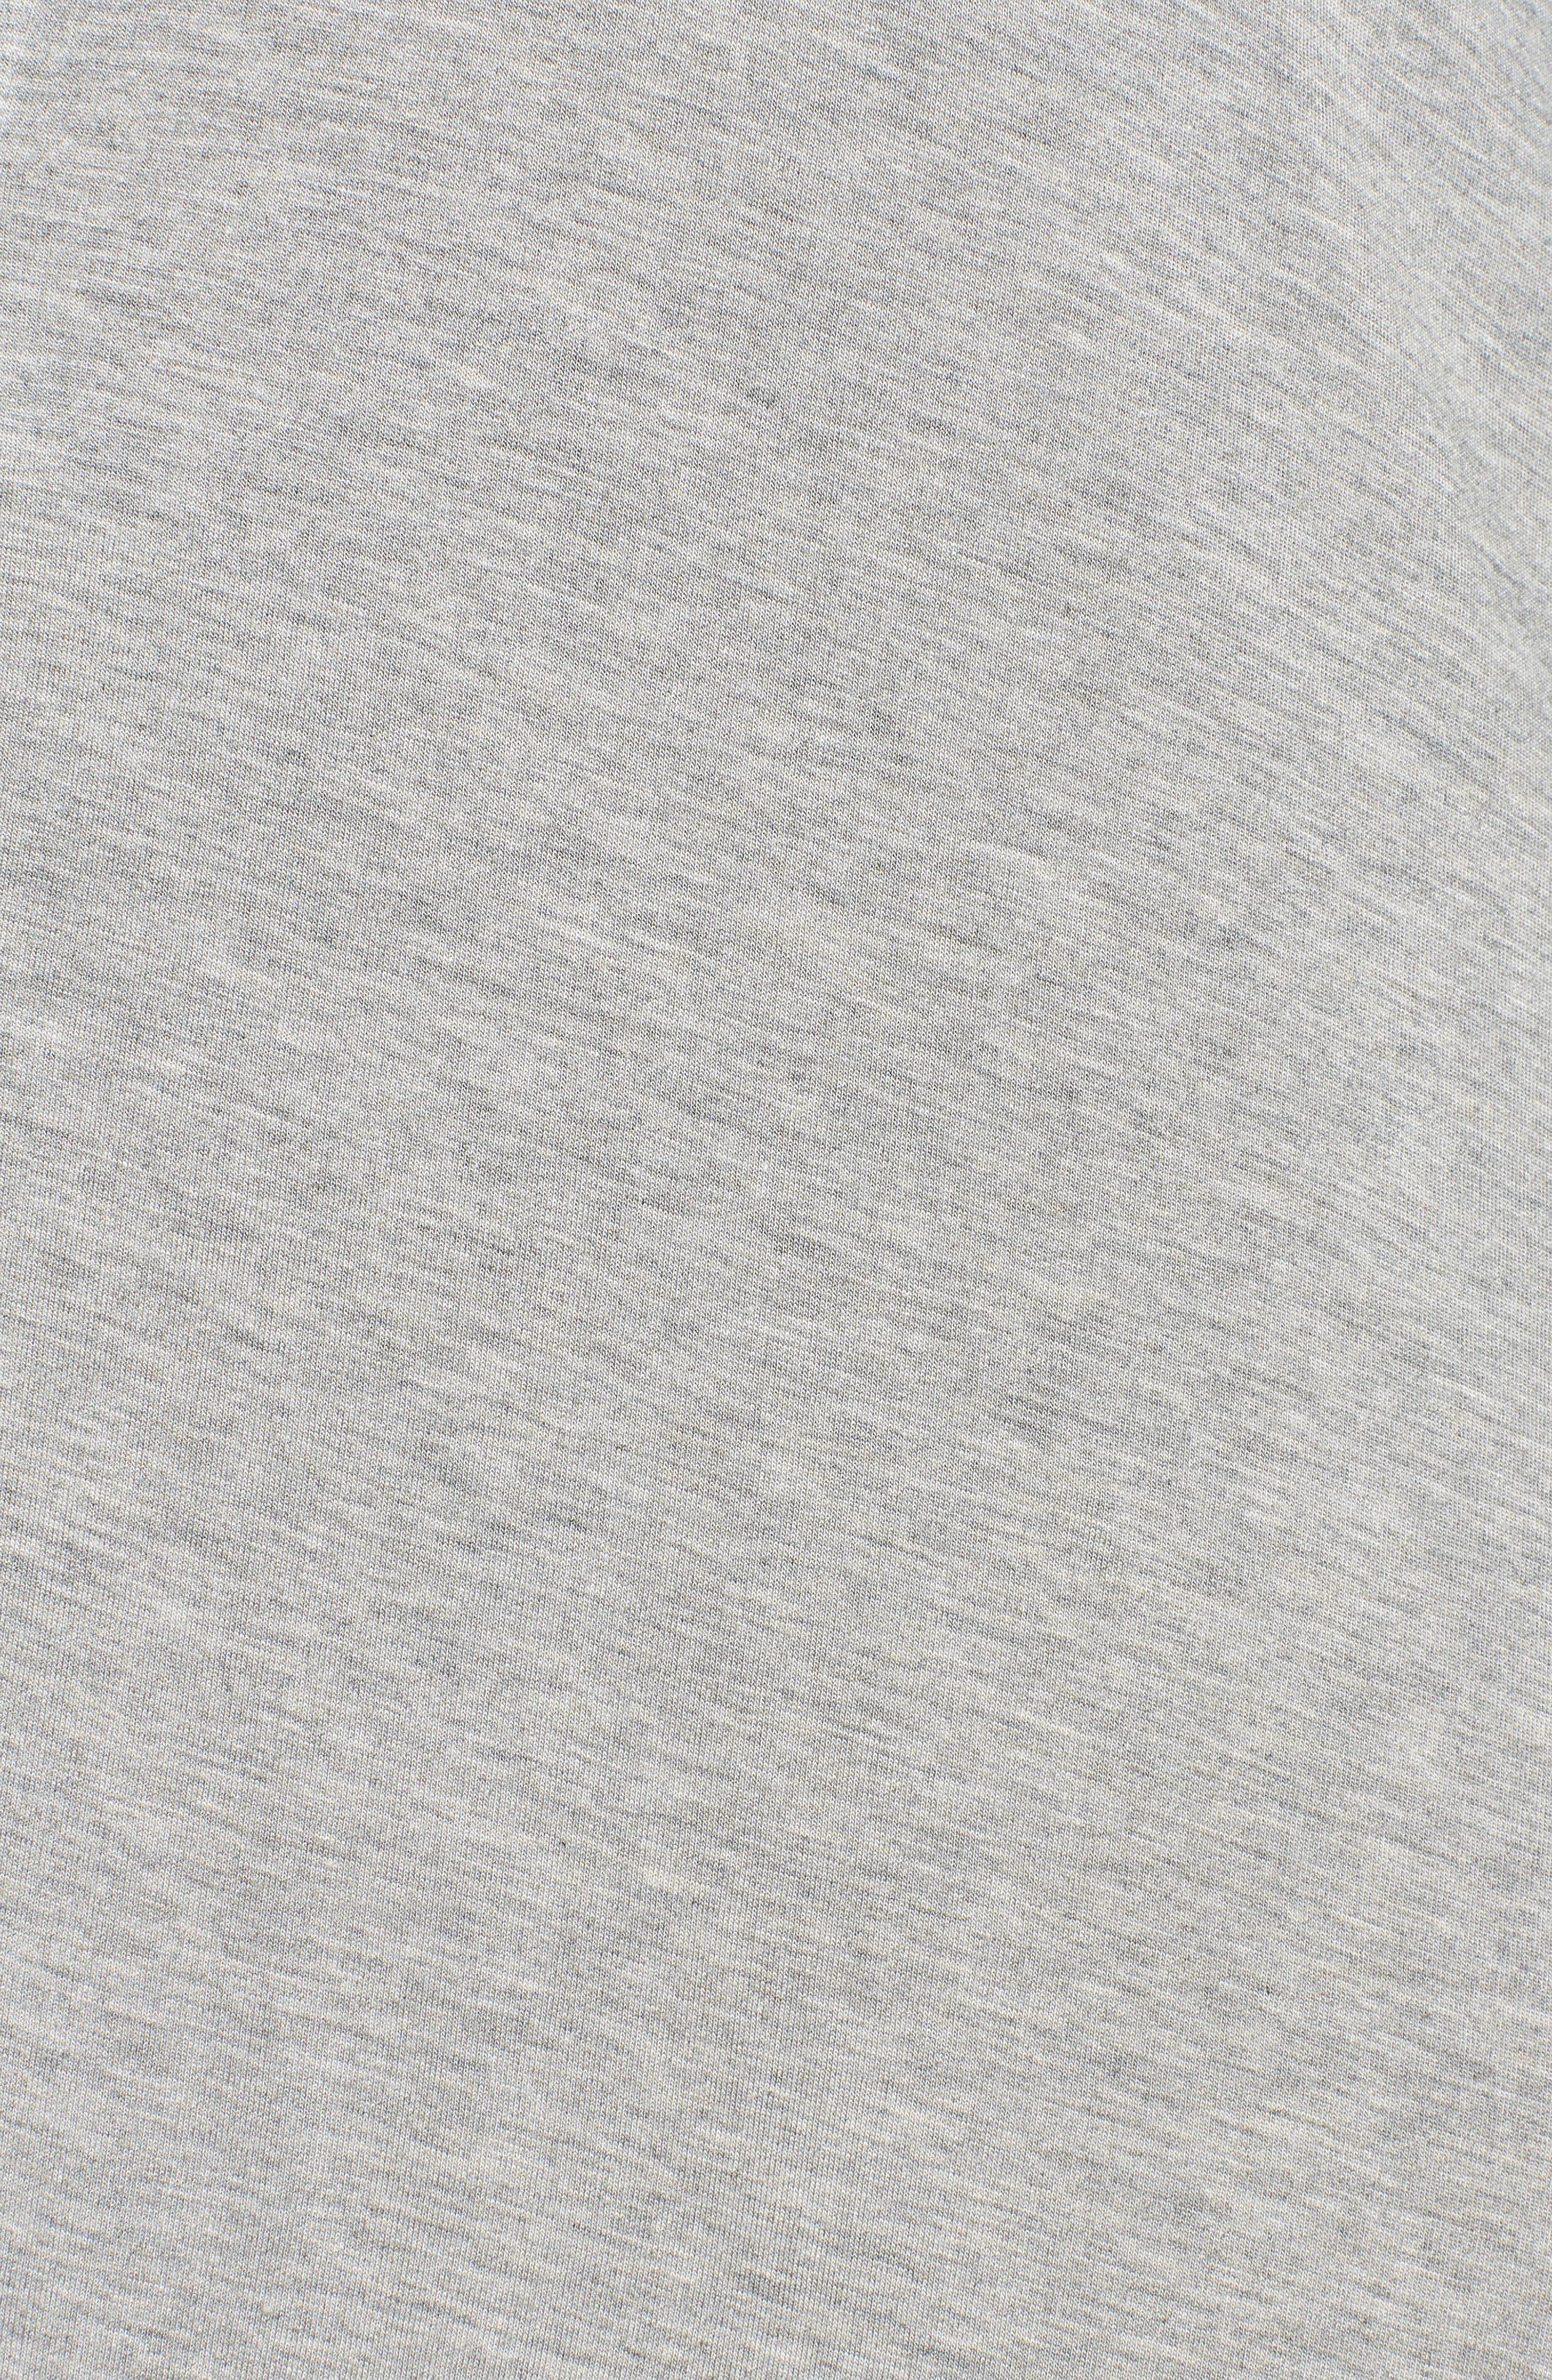 LAUREN RALPH LAUREN,                             Sleep Shirt,                             Alternate thumbnail 5, color,                             GREY